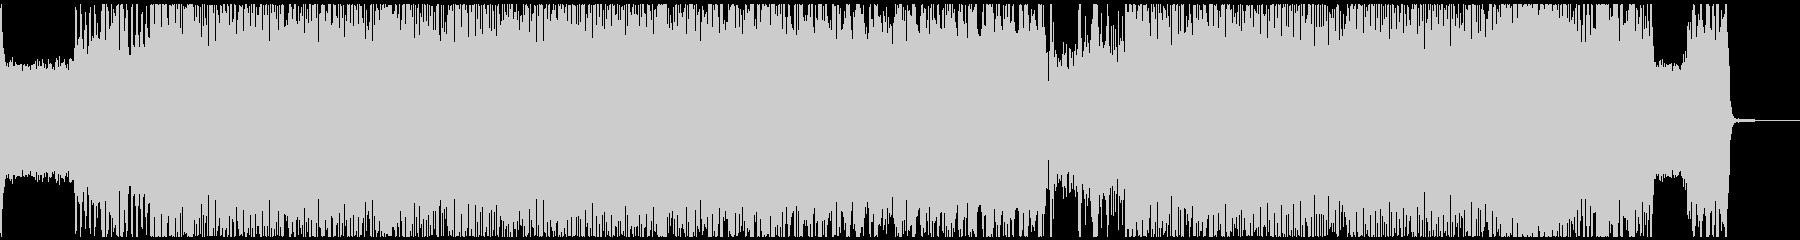 Slipknot風・極悪デスメタルの未再生の波形